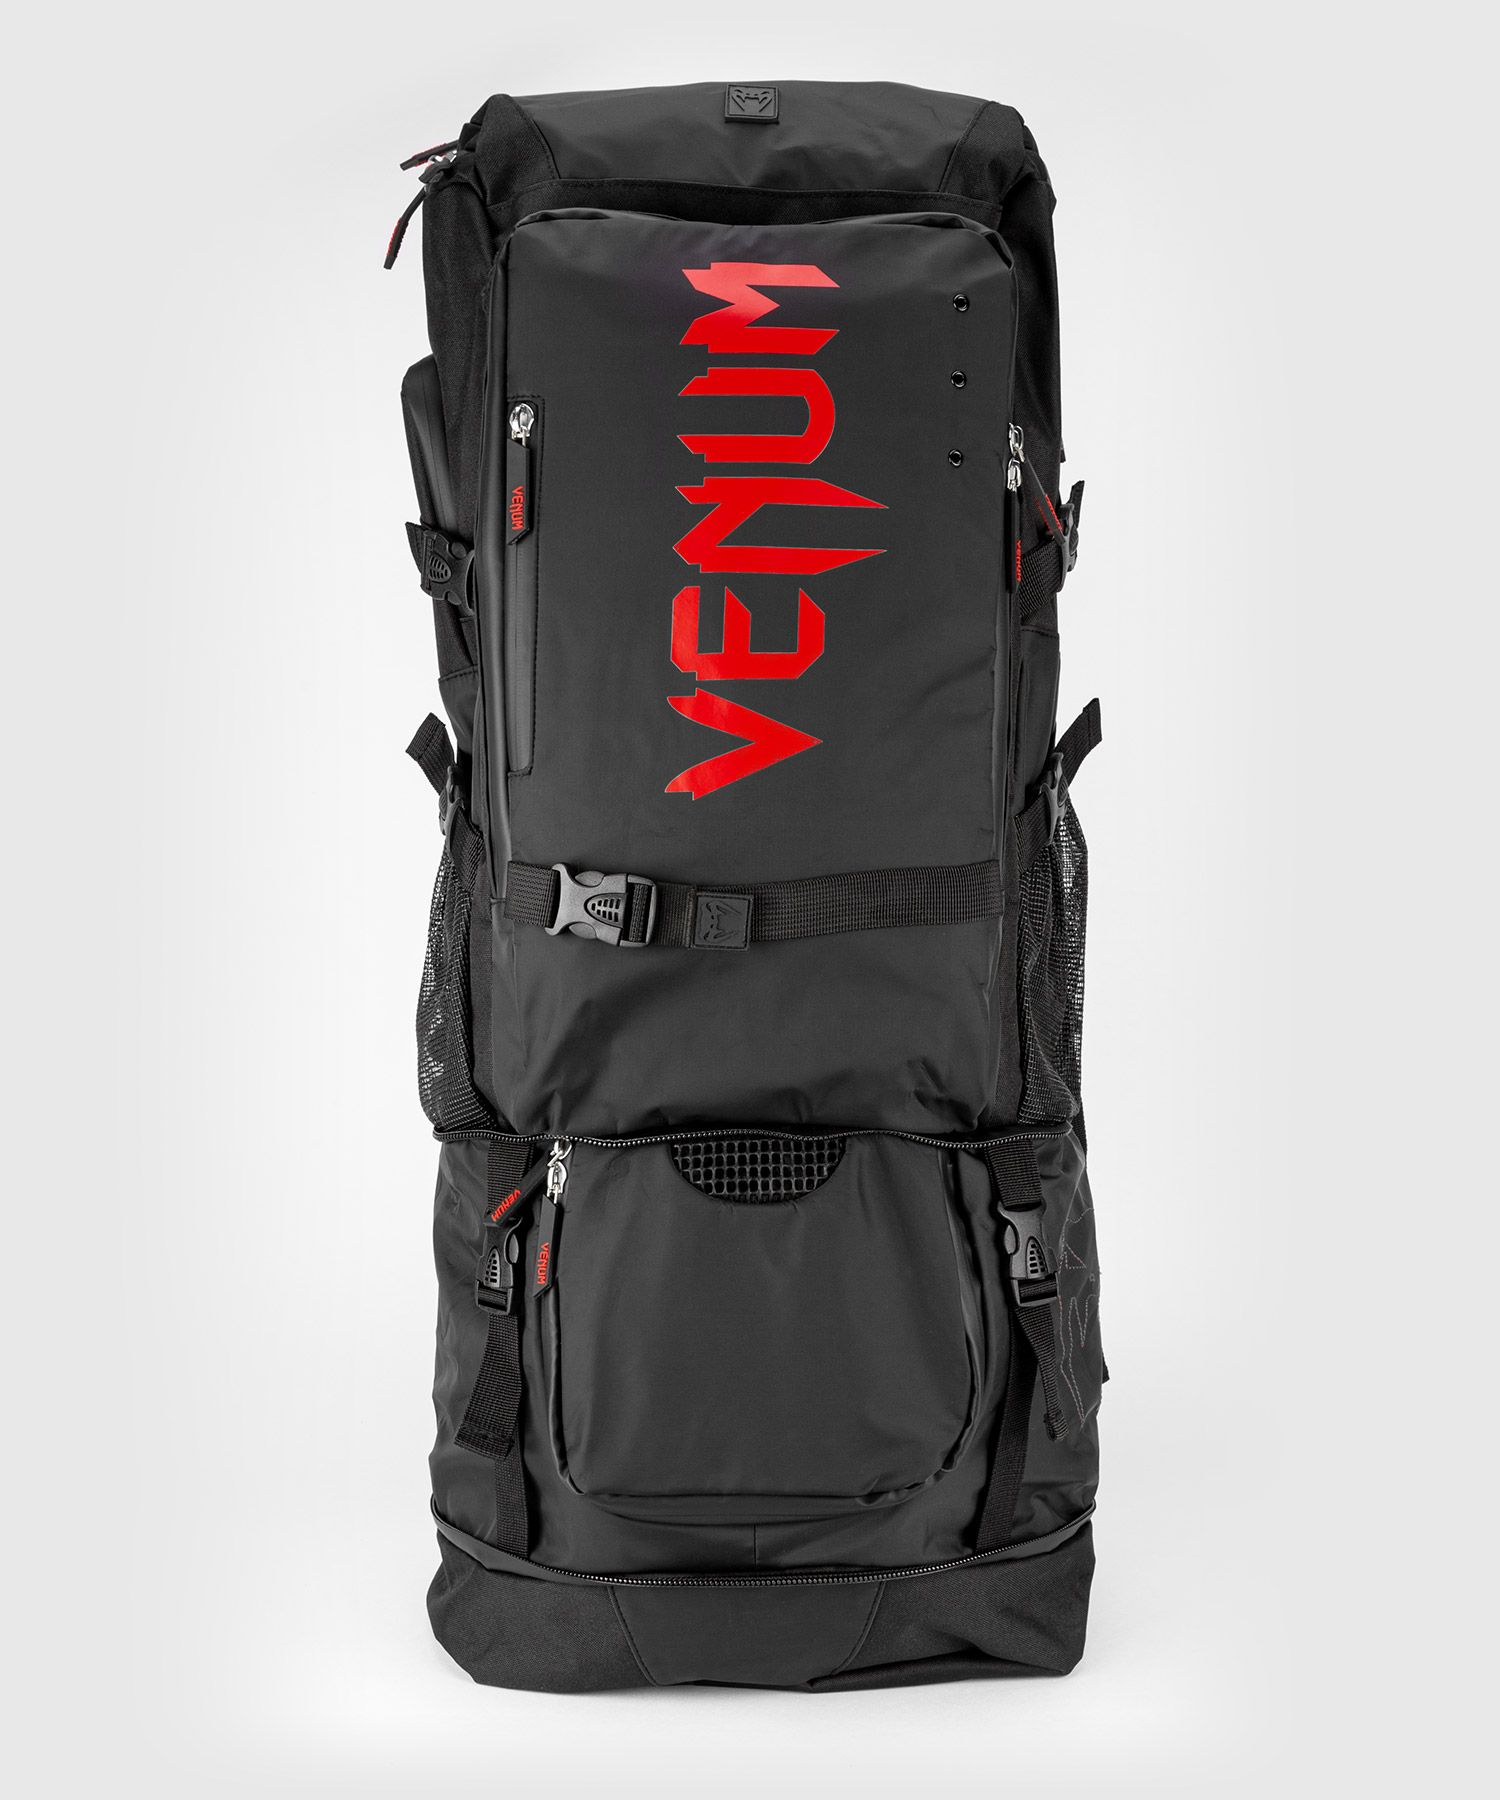 Zaino Venum Challenger Xtreme Evo - Nero/Rosso